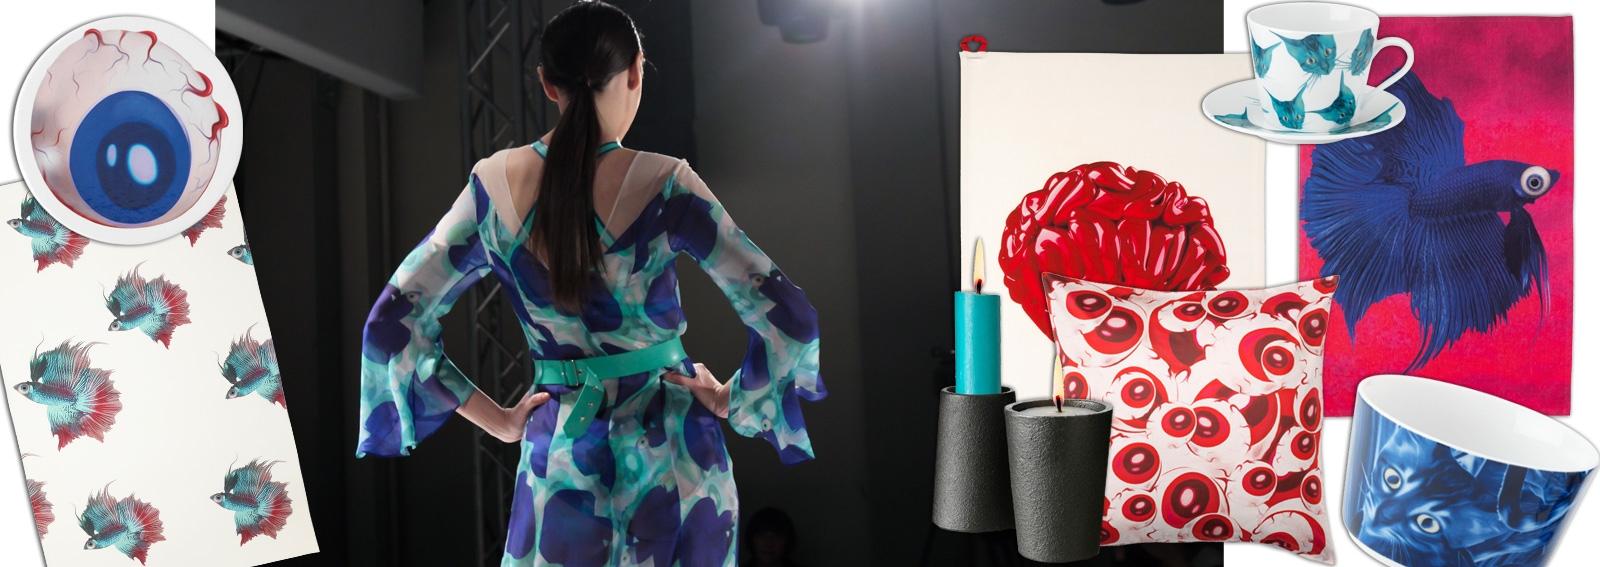 cover-ikeafashion-ikea-sceglie-la-moda-desktop